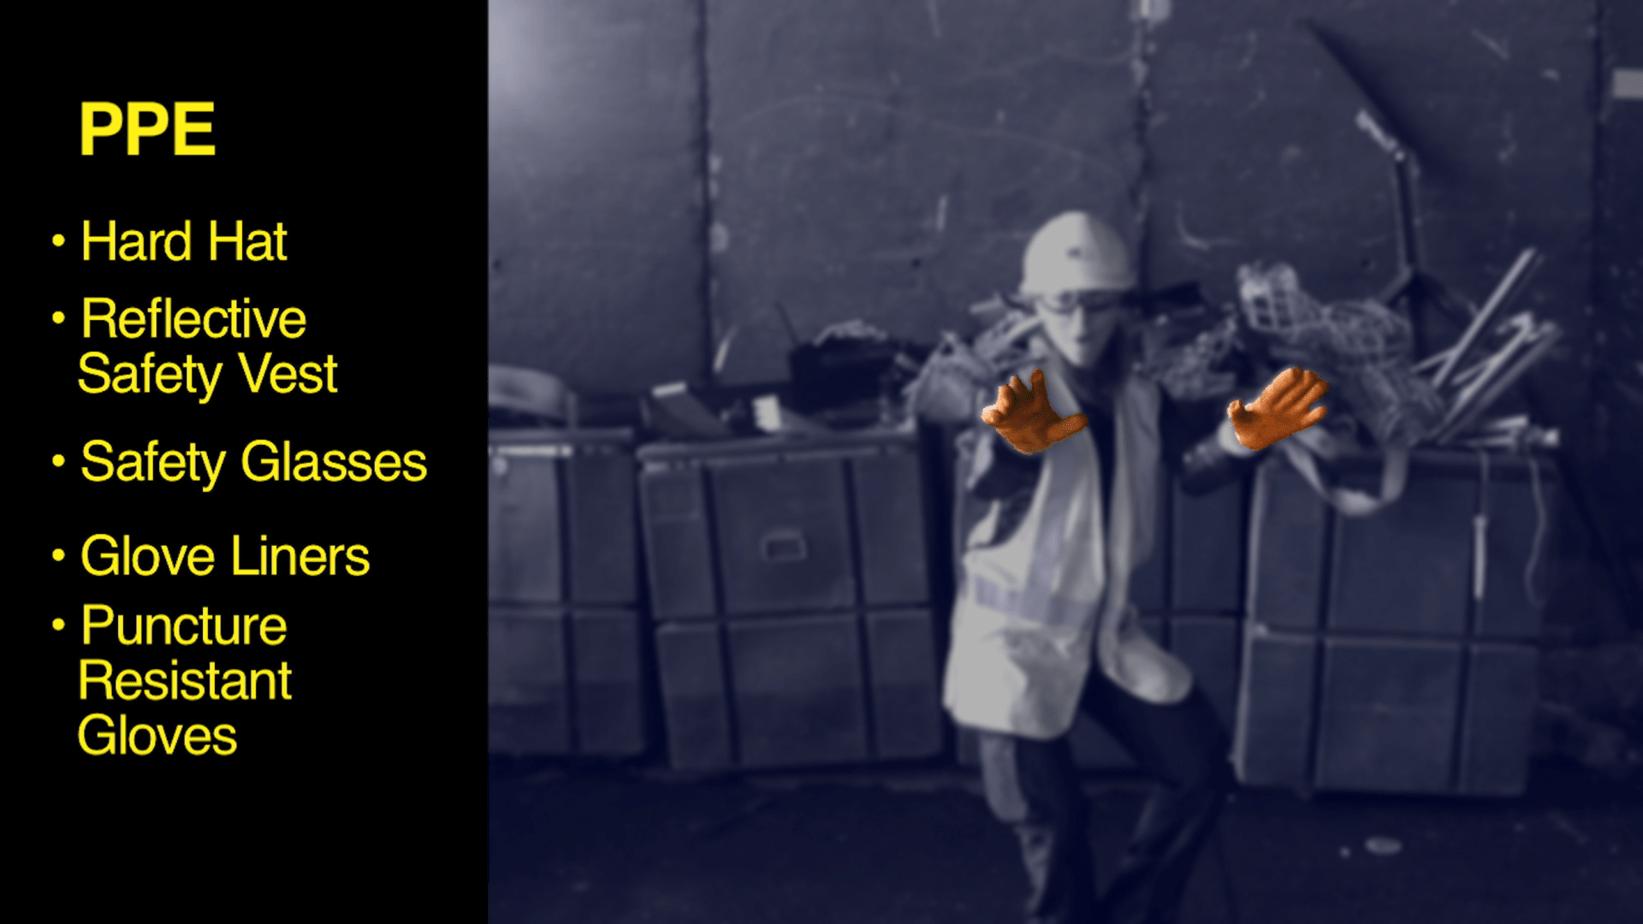 Waste Management training video still - PPE